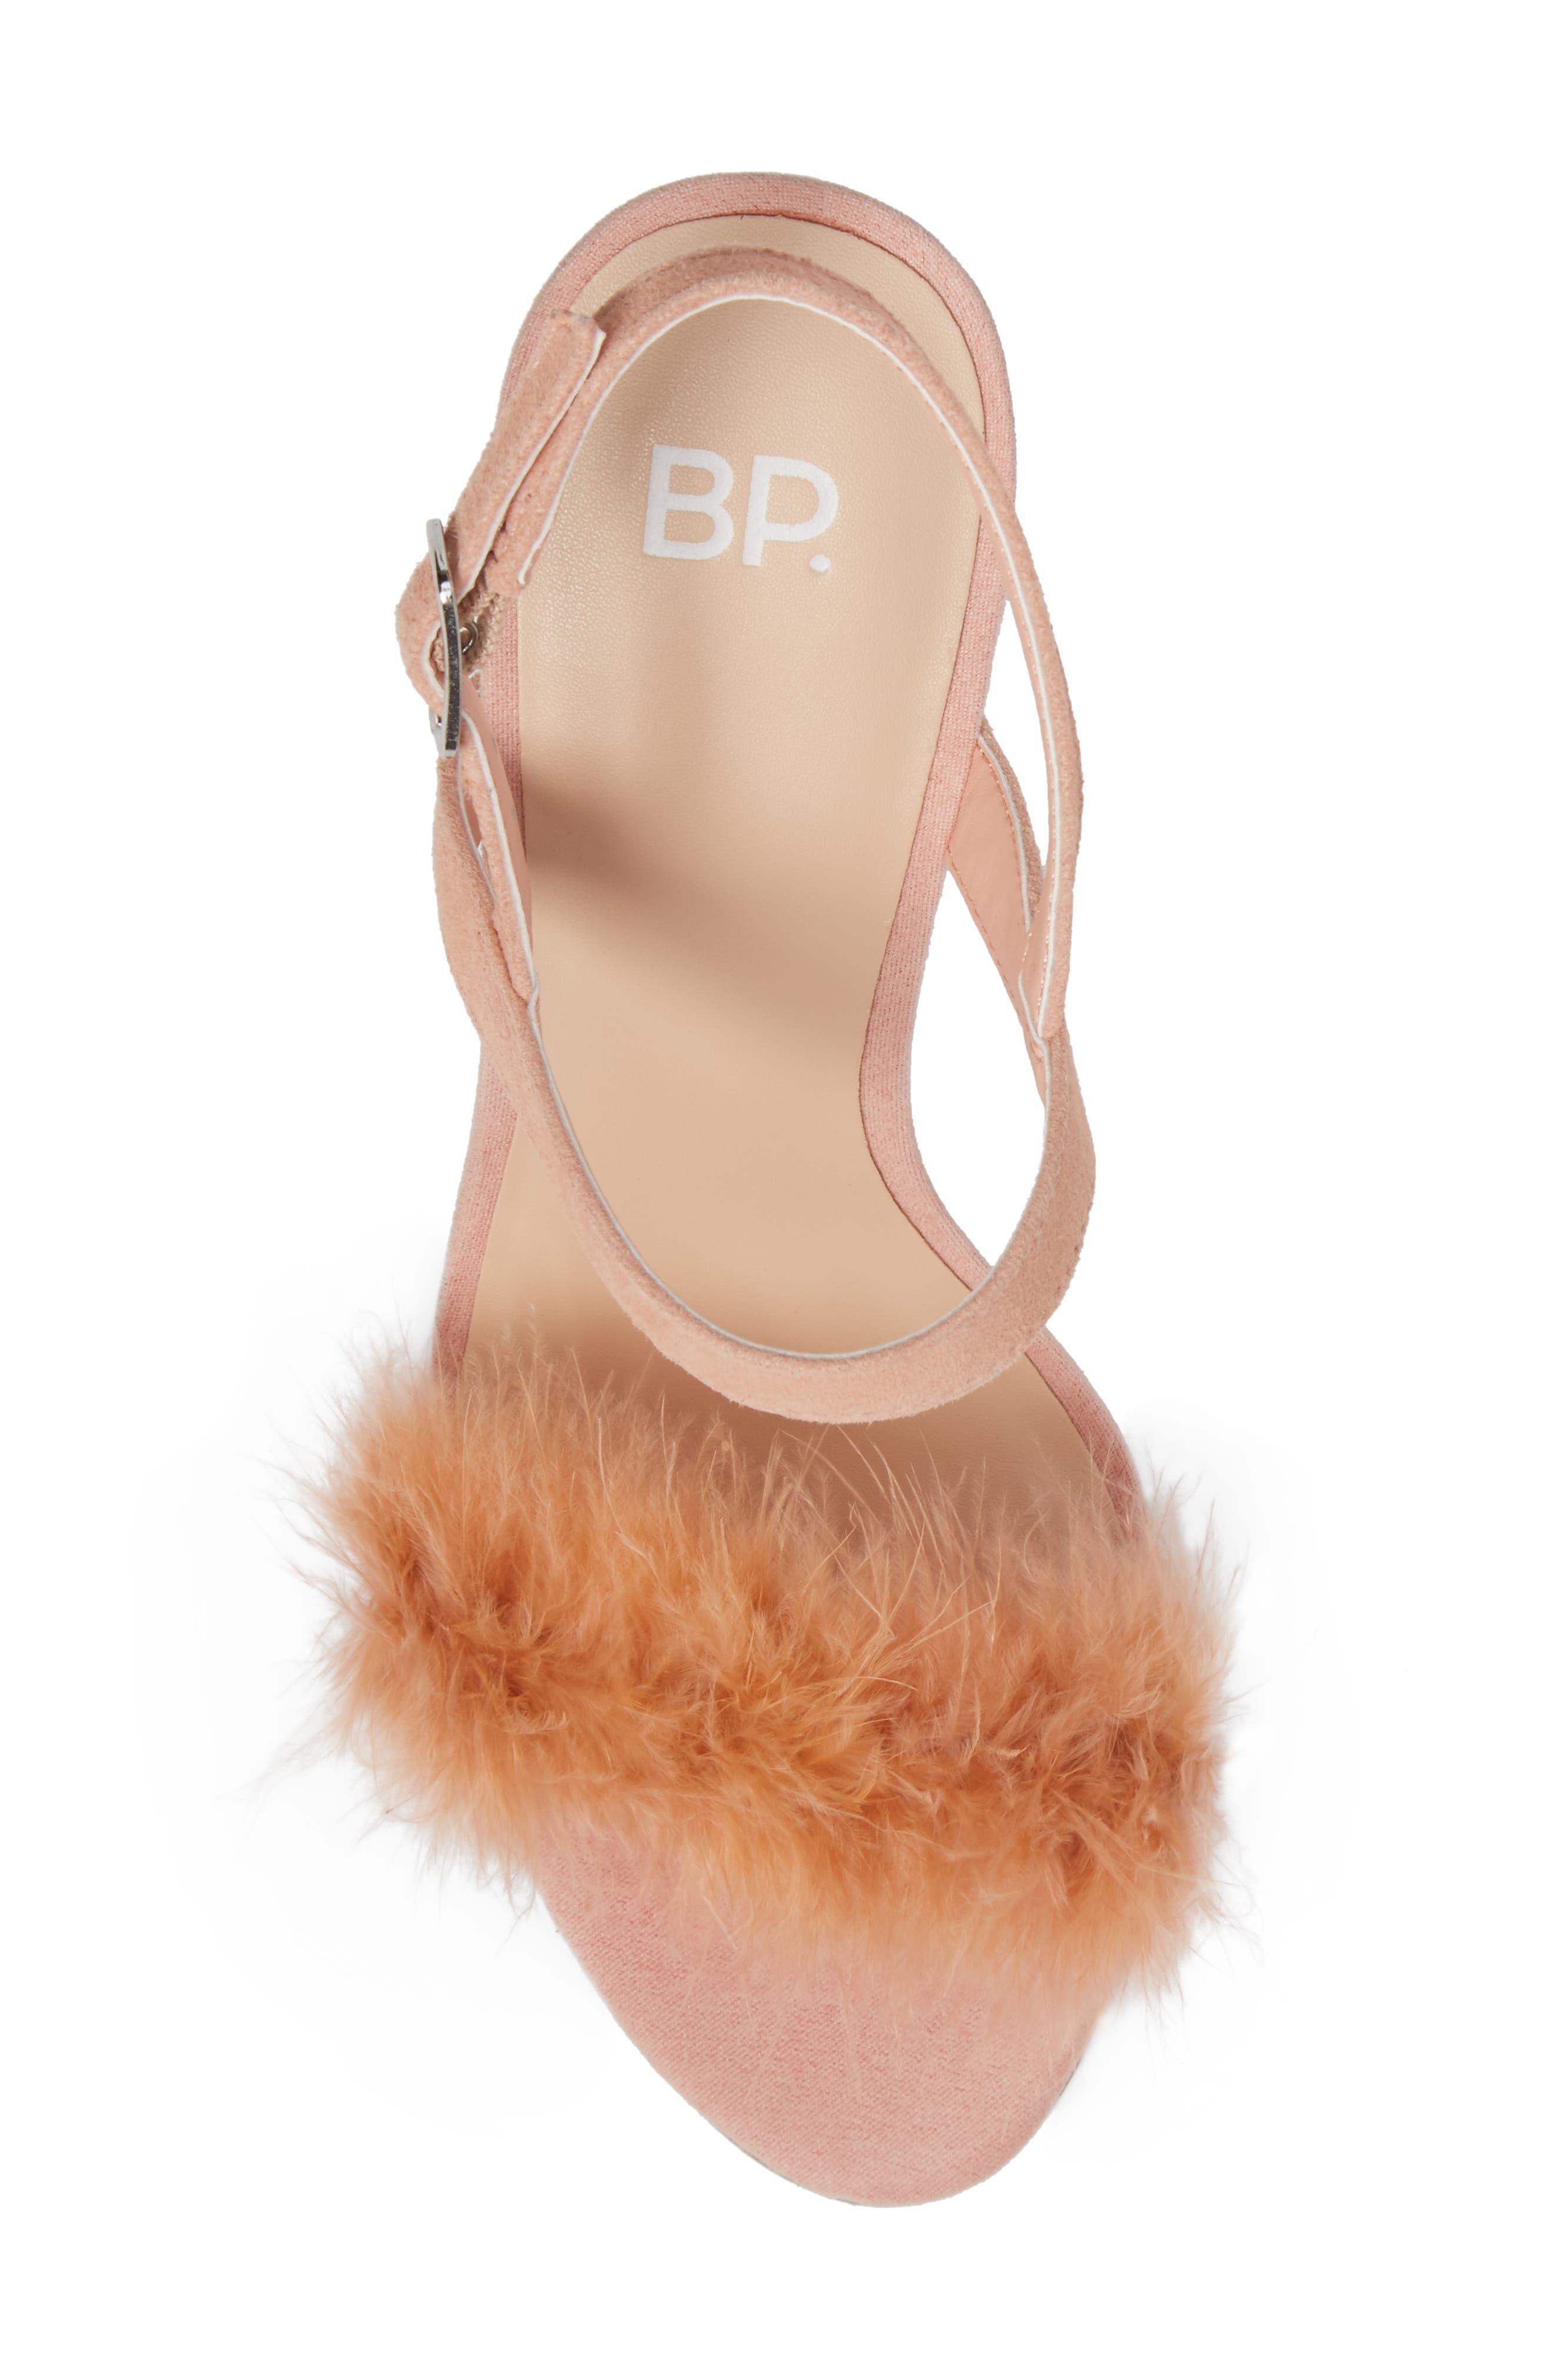 Lula Block Heel Slingback Sandal,                             Alternate thumbnail 5, color,                             Blush Feathers